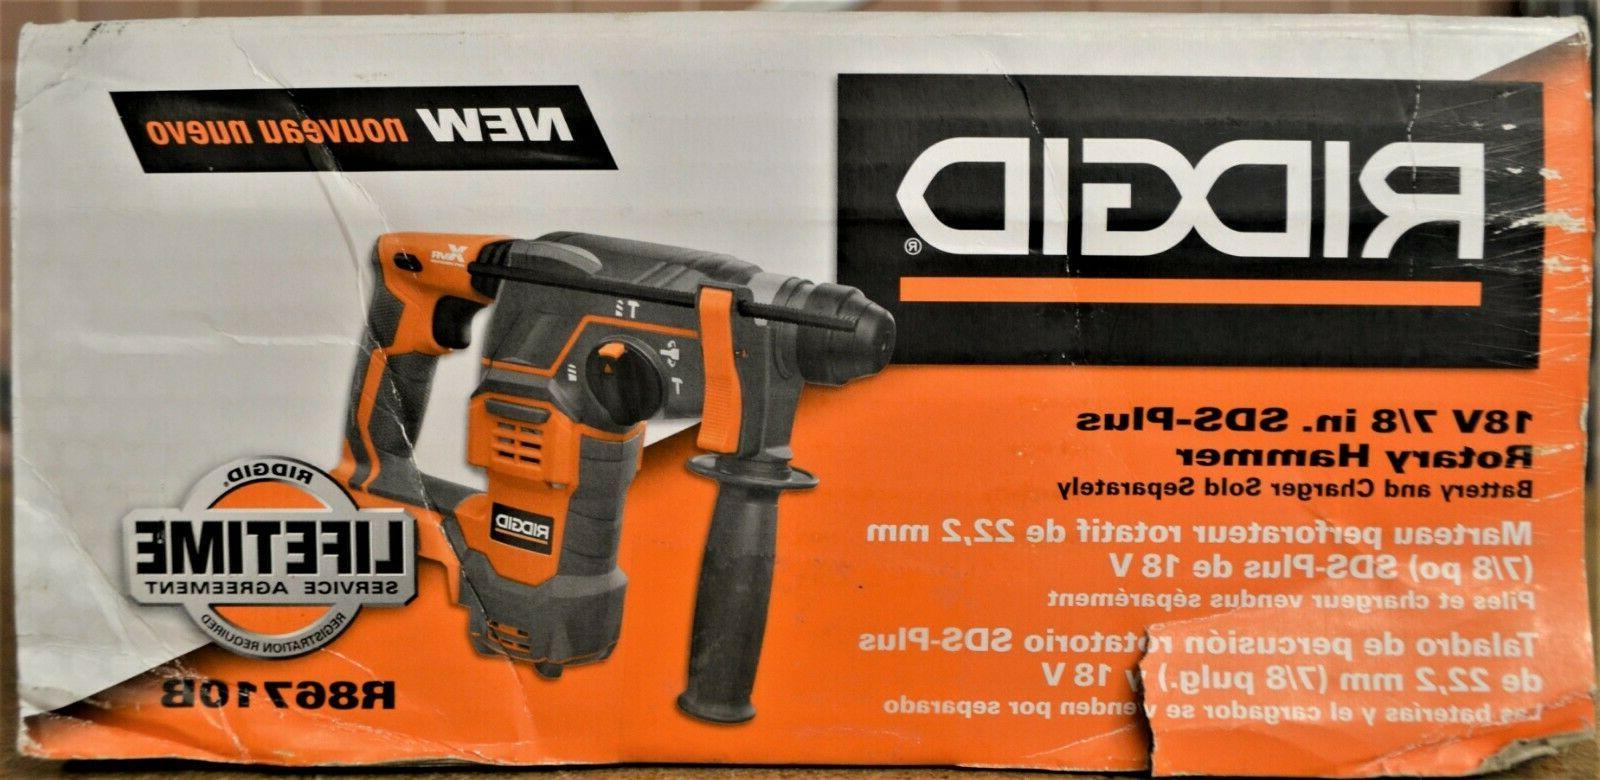 "Ridgid R86710B 18V Cordless 7/8"" SDS-Plus Hammer Drill"